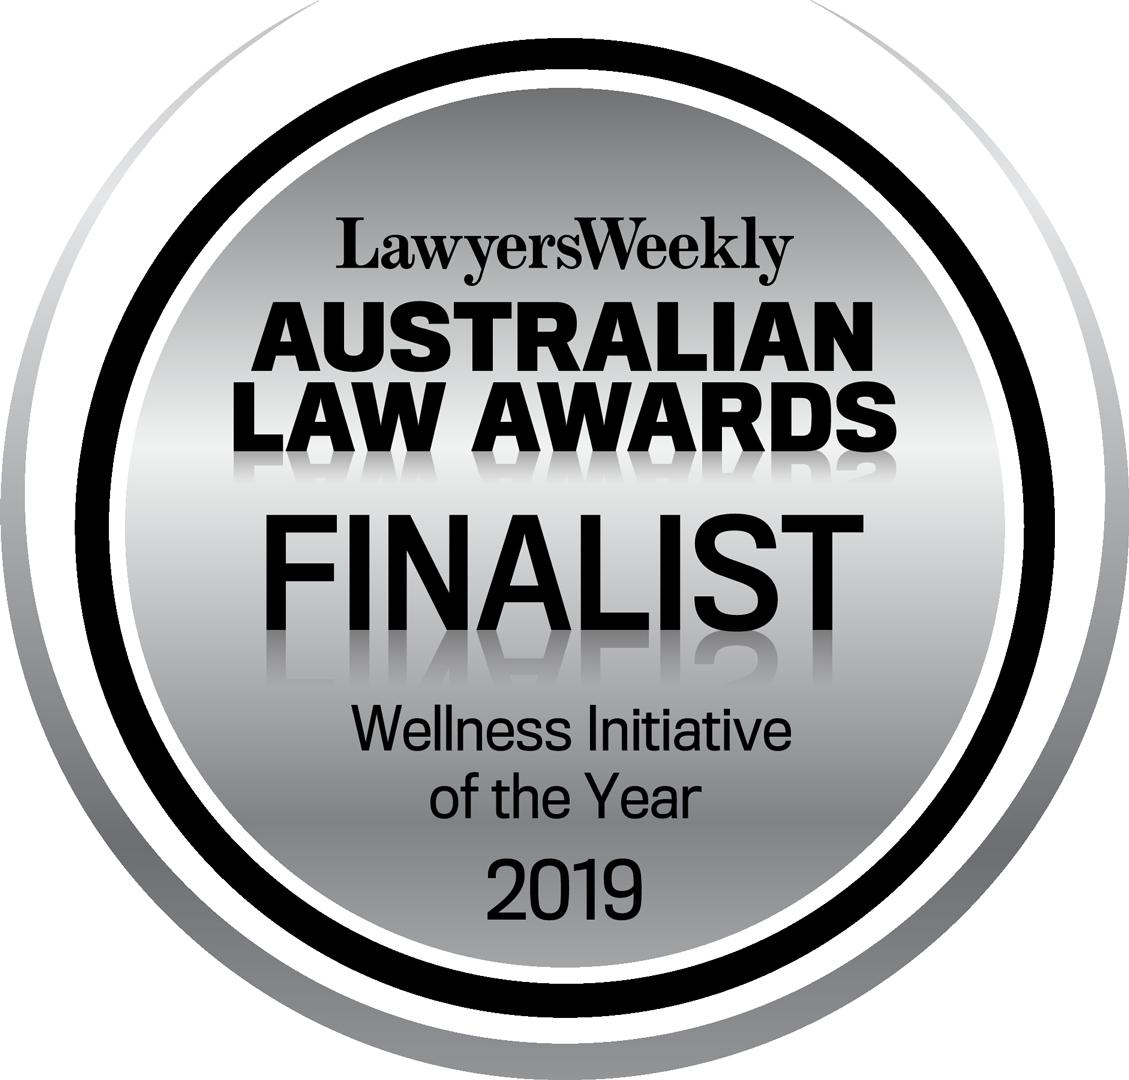 ALA_2019_Wellness-Initiative-of-the-Year_WEB